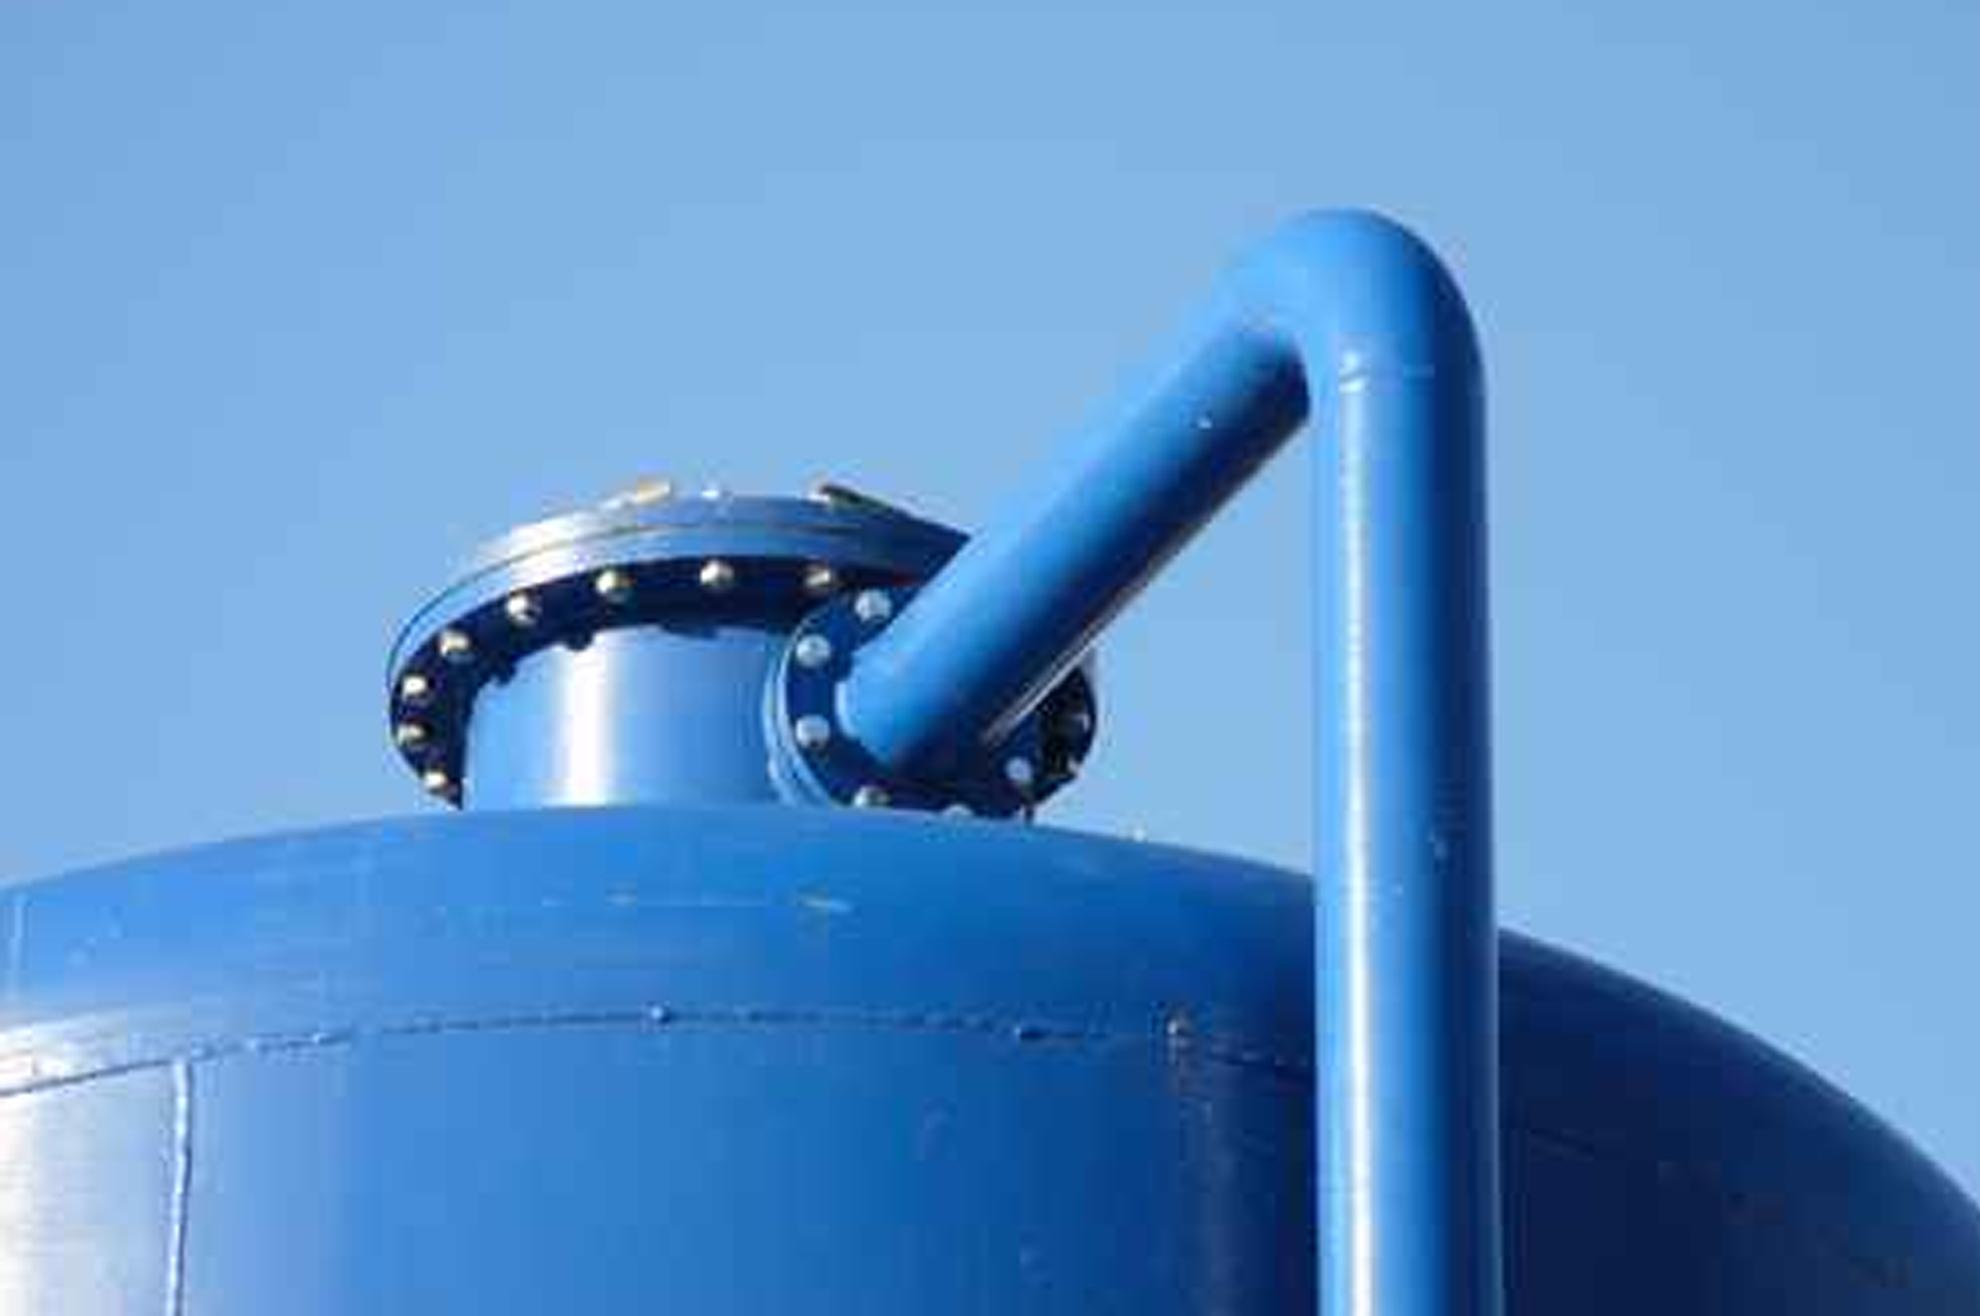 Tankreinigung Öltank